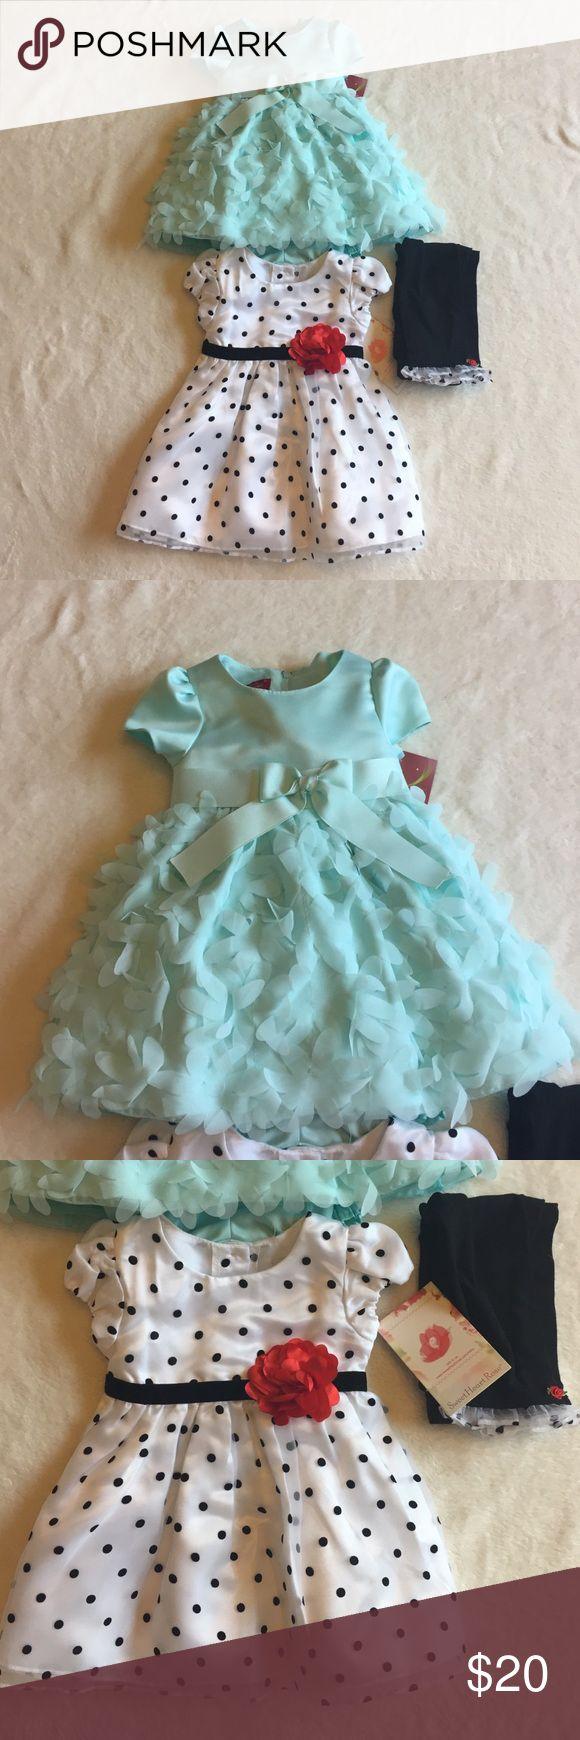 Baby Girl 9 & 12 month formal dress bundle NWT formal dress Bundle! The top teal dress is 9 months and bottom polka dot dress is 12 months. Perfect for a summer wedding! Sweet Heart Rose Dresses Formal